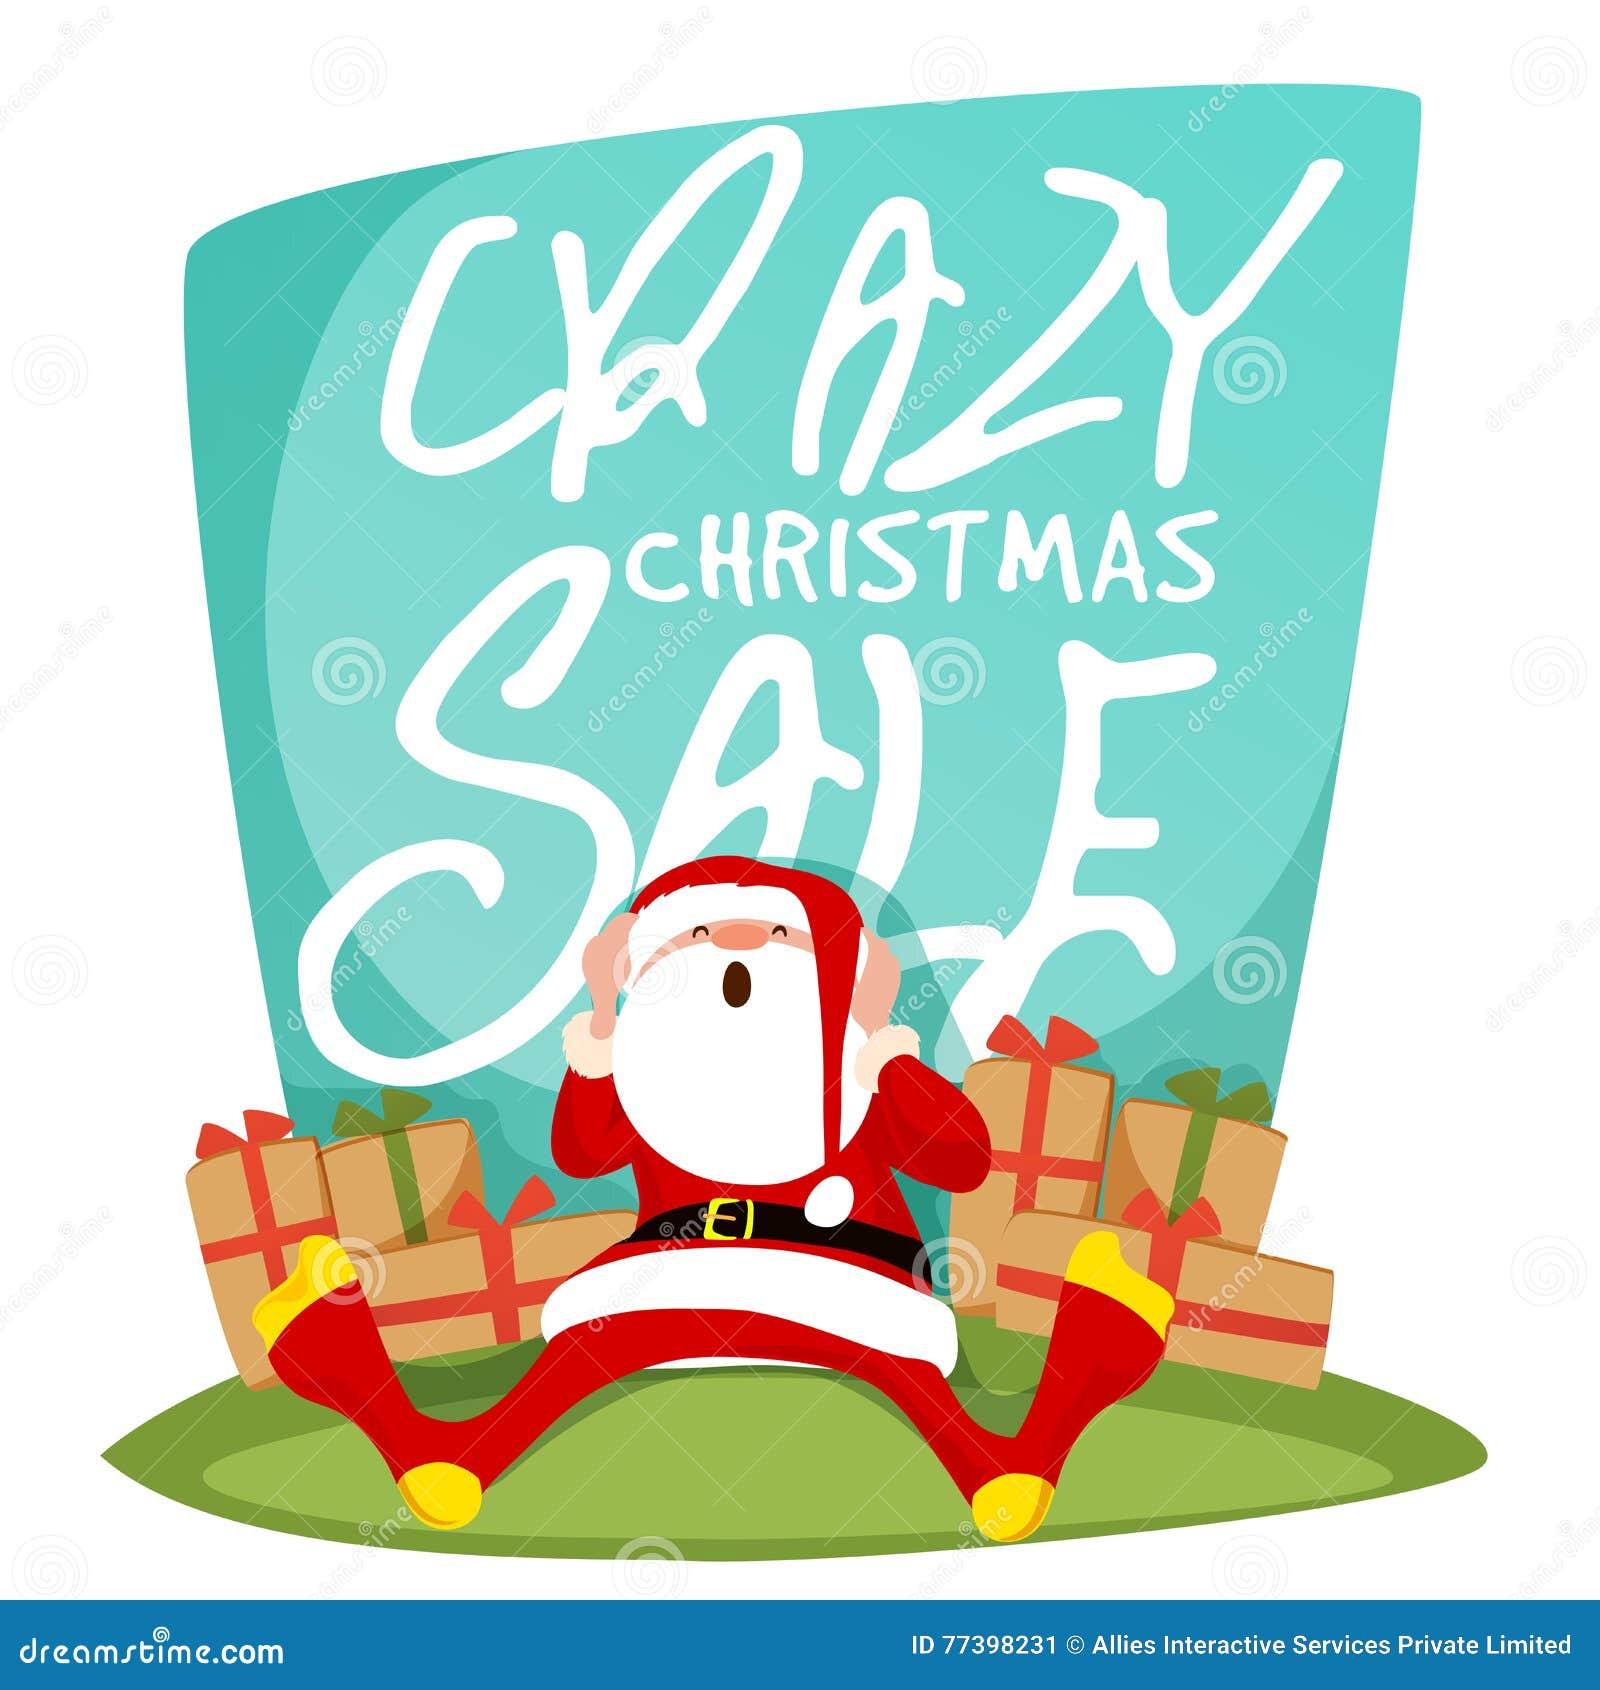 Crazy Christmas Sale Poster, Banner Or Flyer. Stock Illustration ...